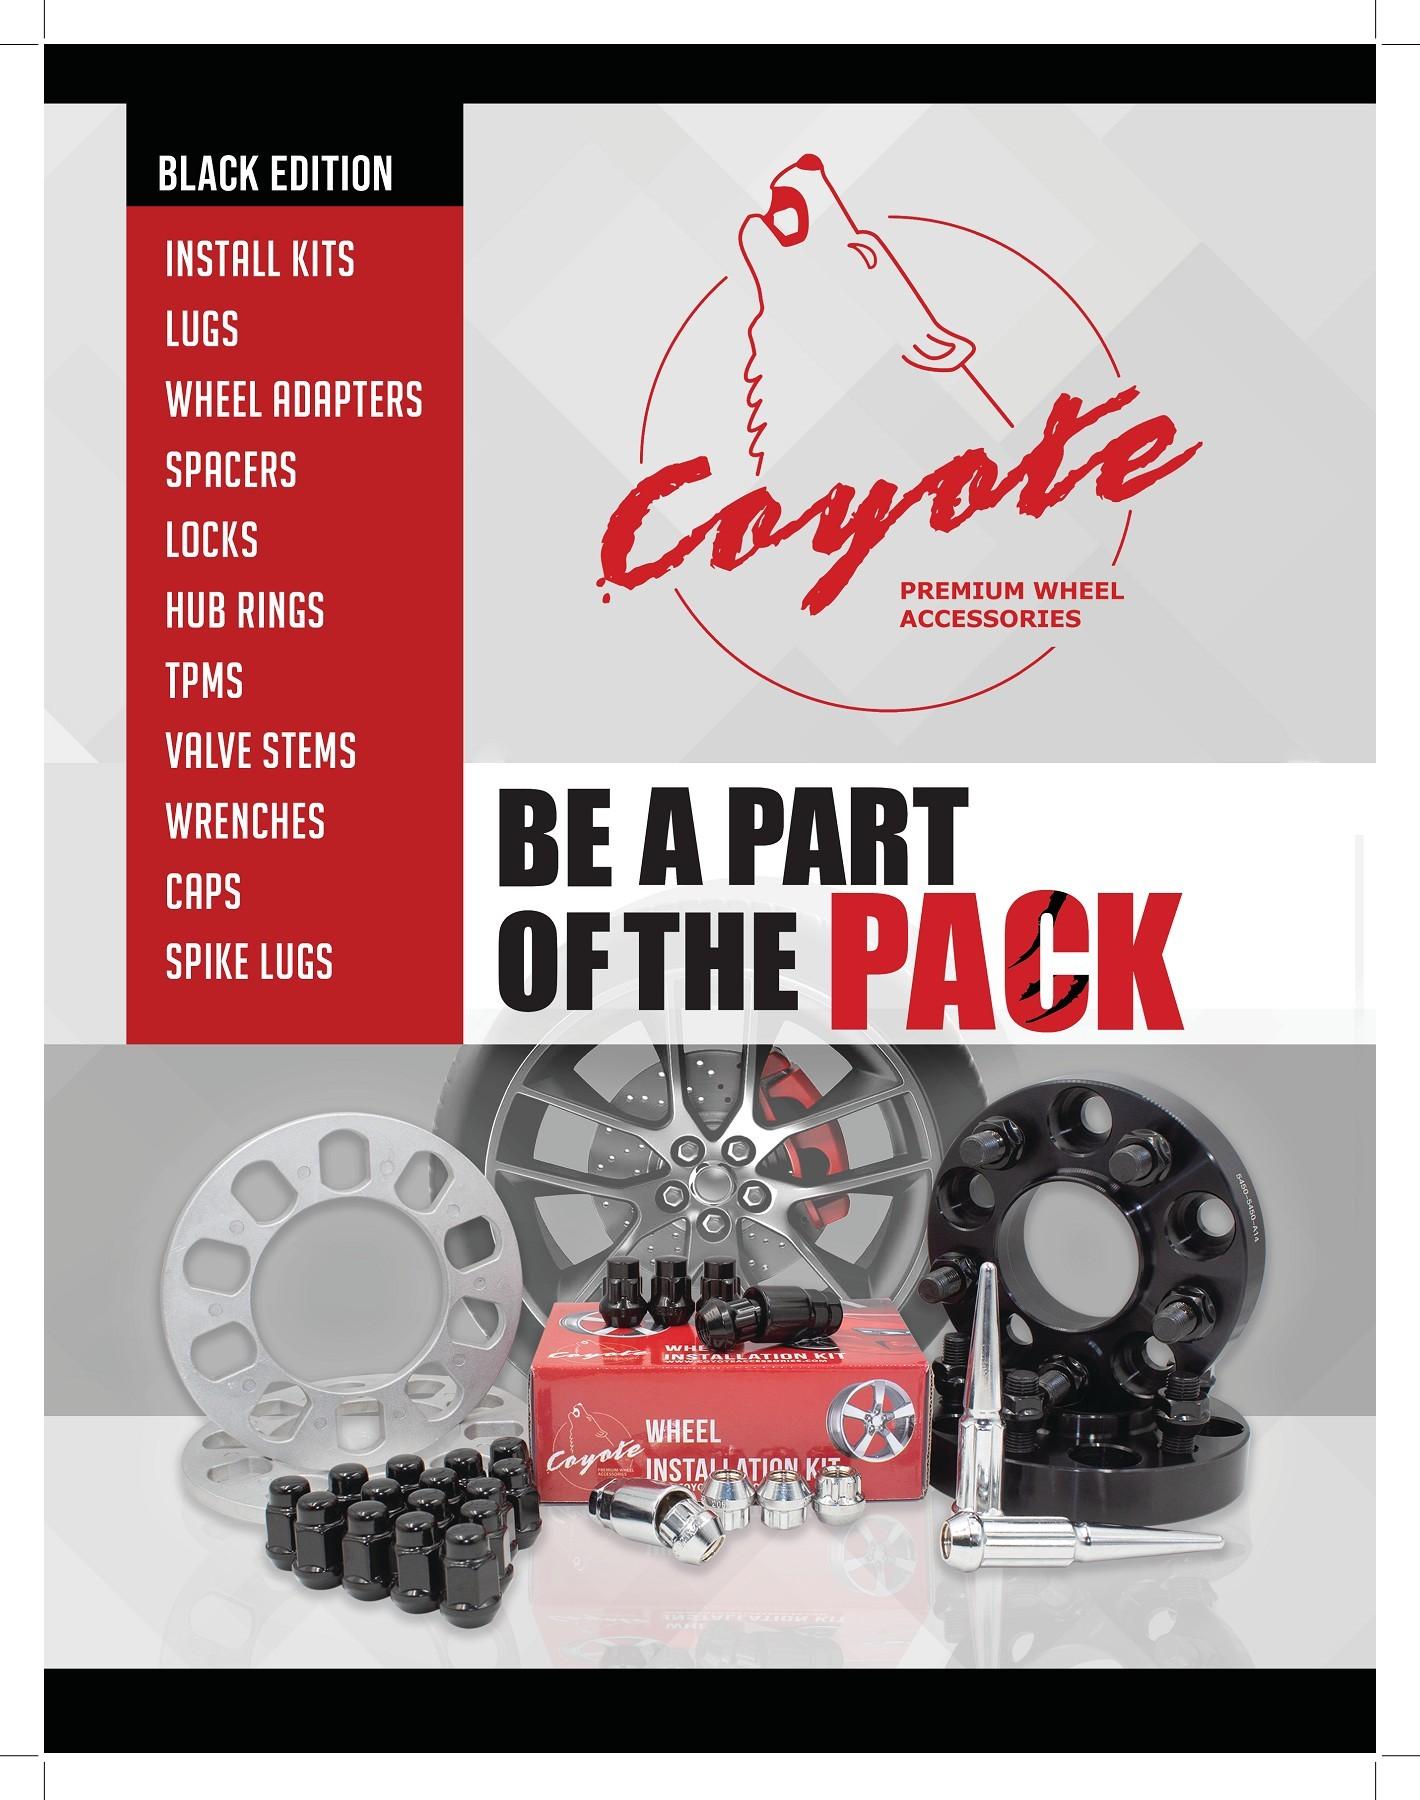 Wheel Accessories Parts Set of 24 Bulge Acorn M14x2.0 Thread 2.00 Long for Trucks 7//8 Hex Black